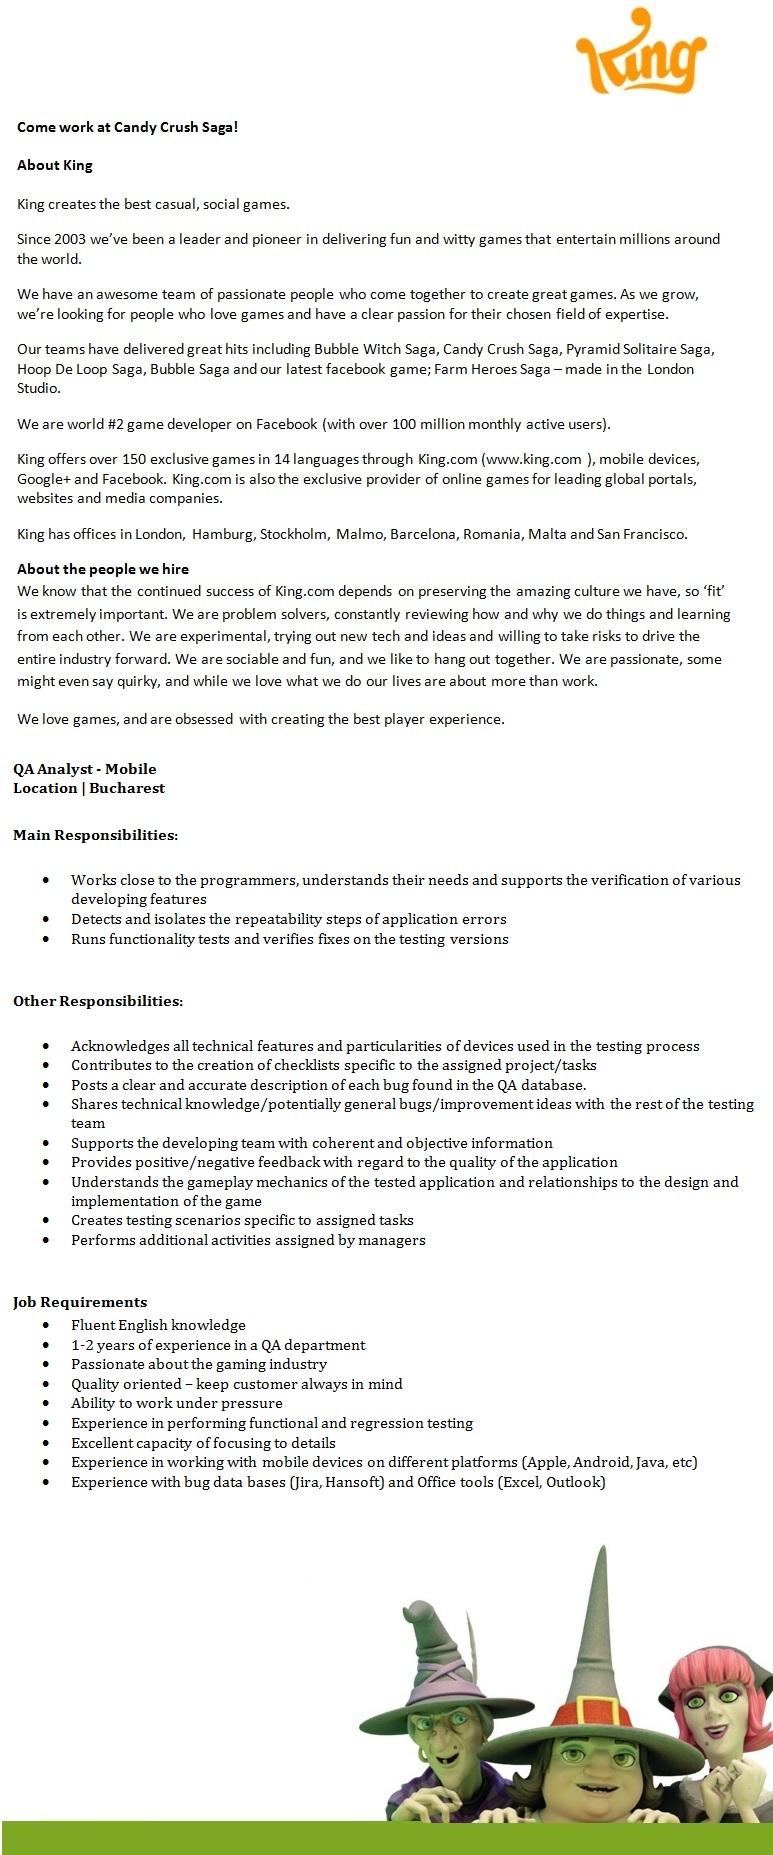 QA Analyst - Mobile